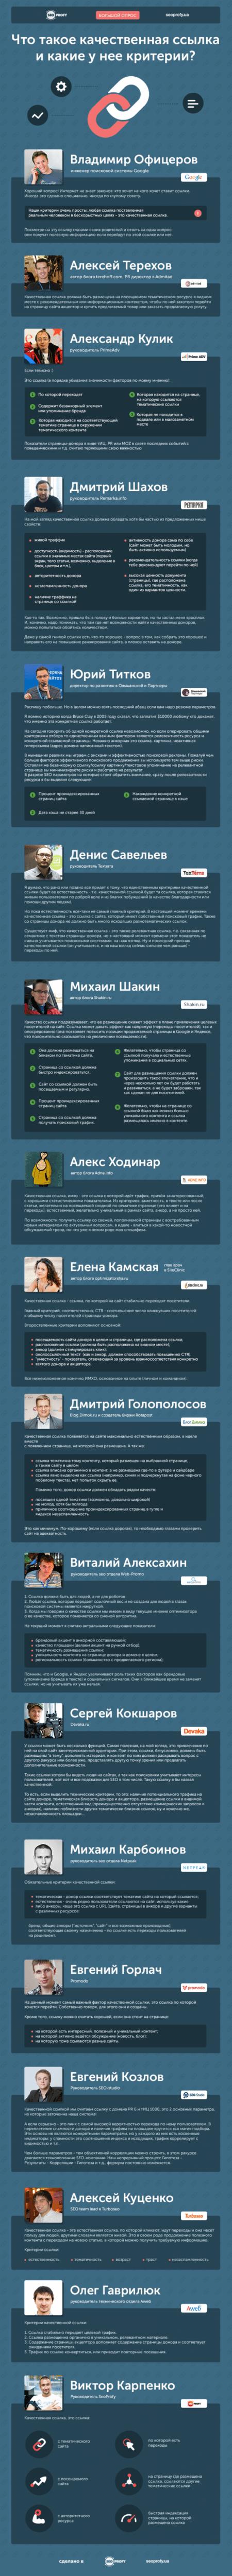 link-infographic1-613x6805-custom